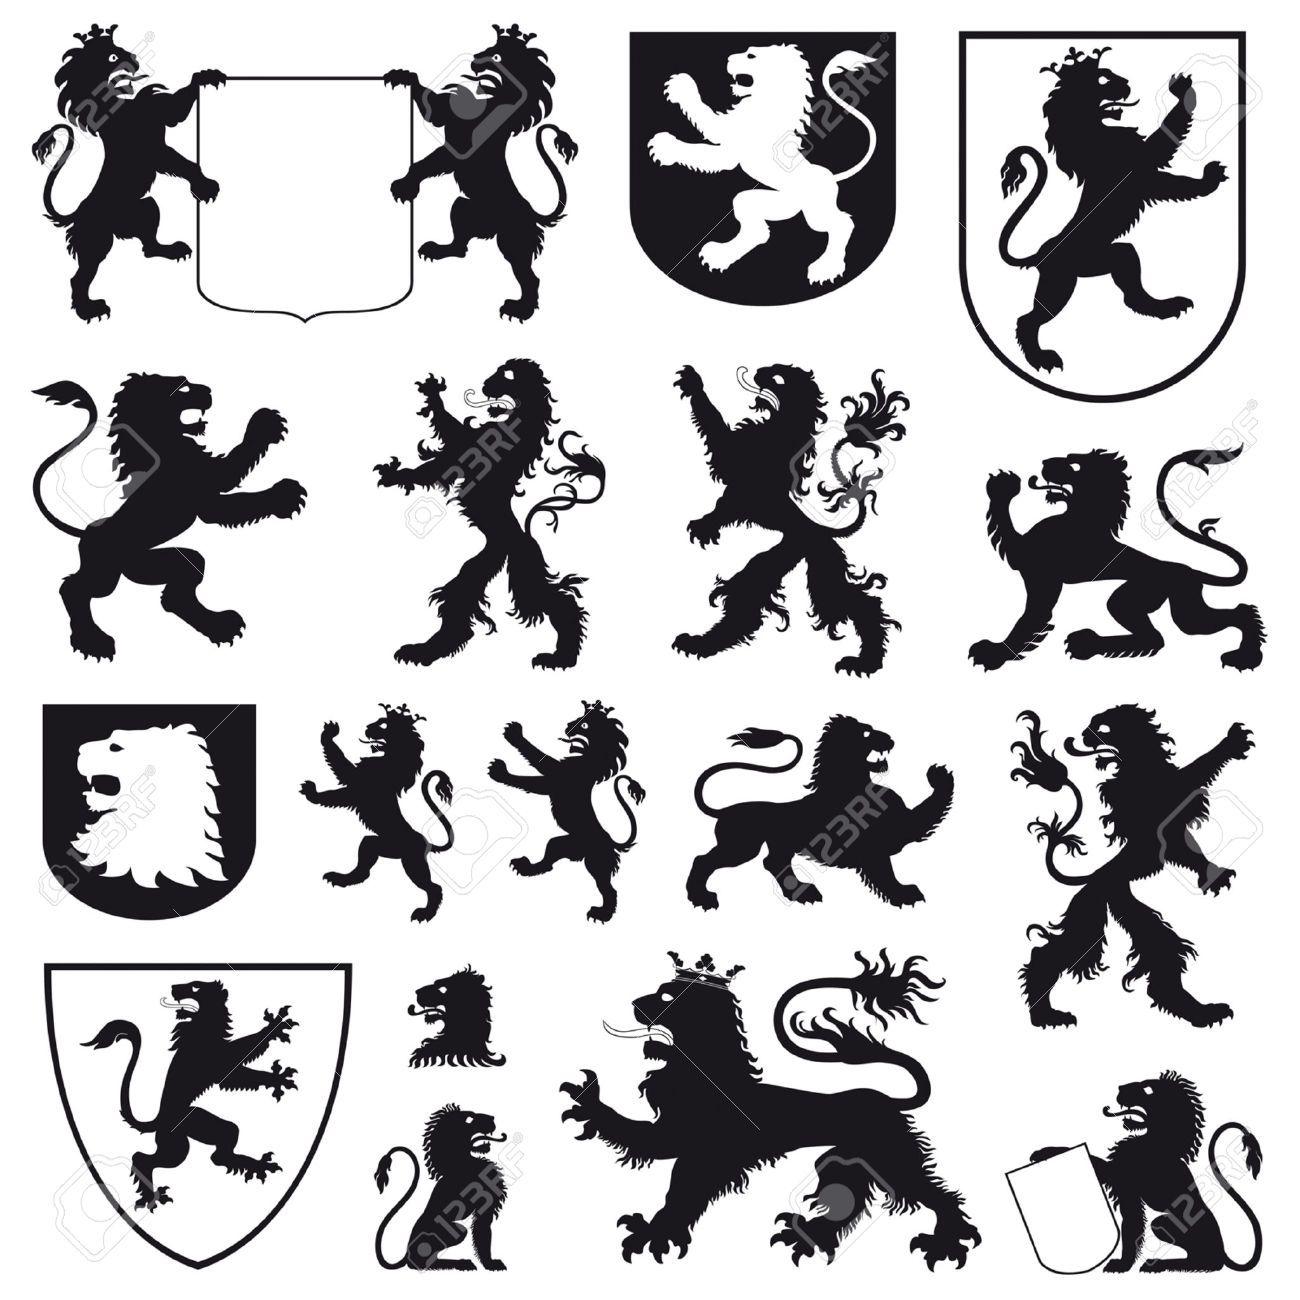 silhouettes of heraldic lions robin hood pinterest